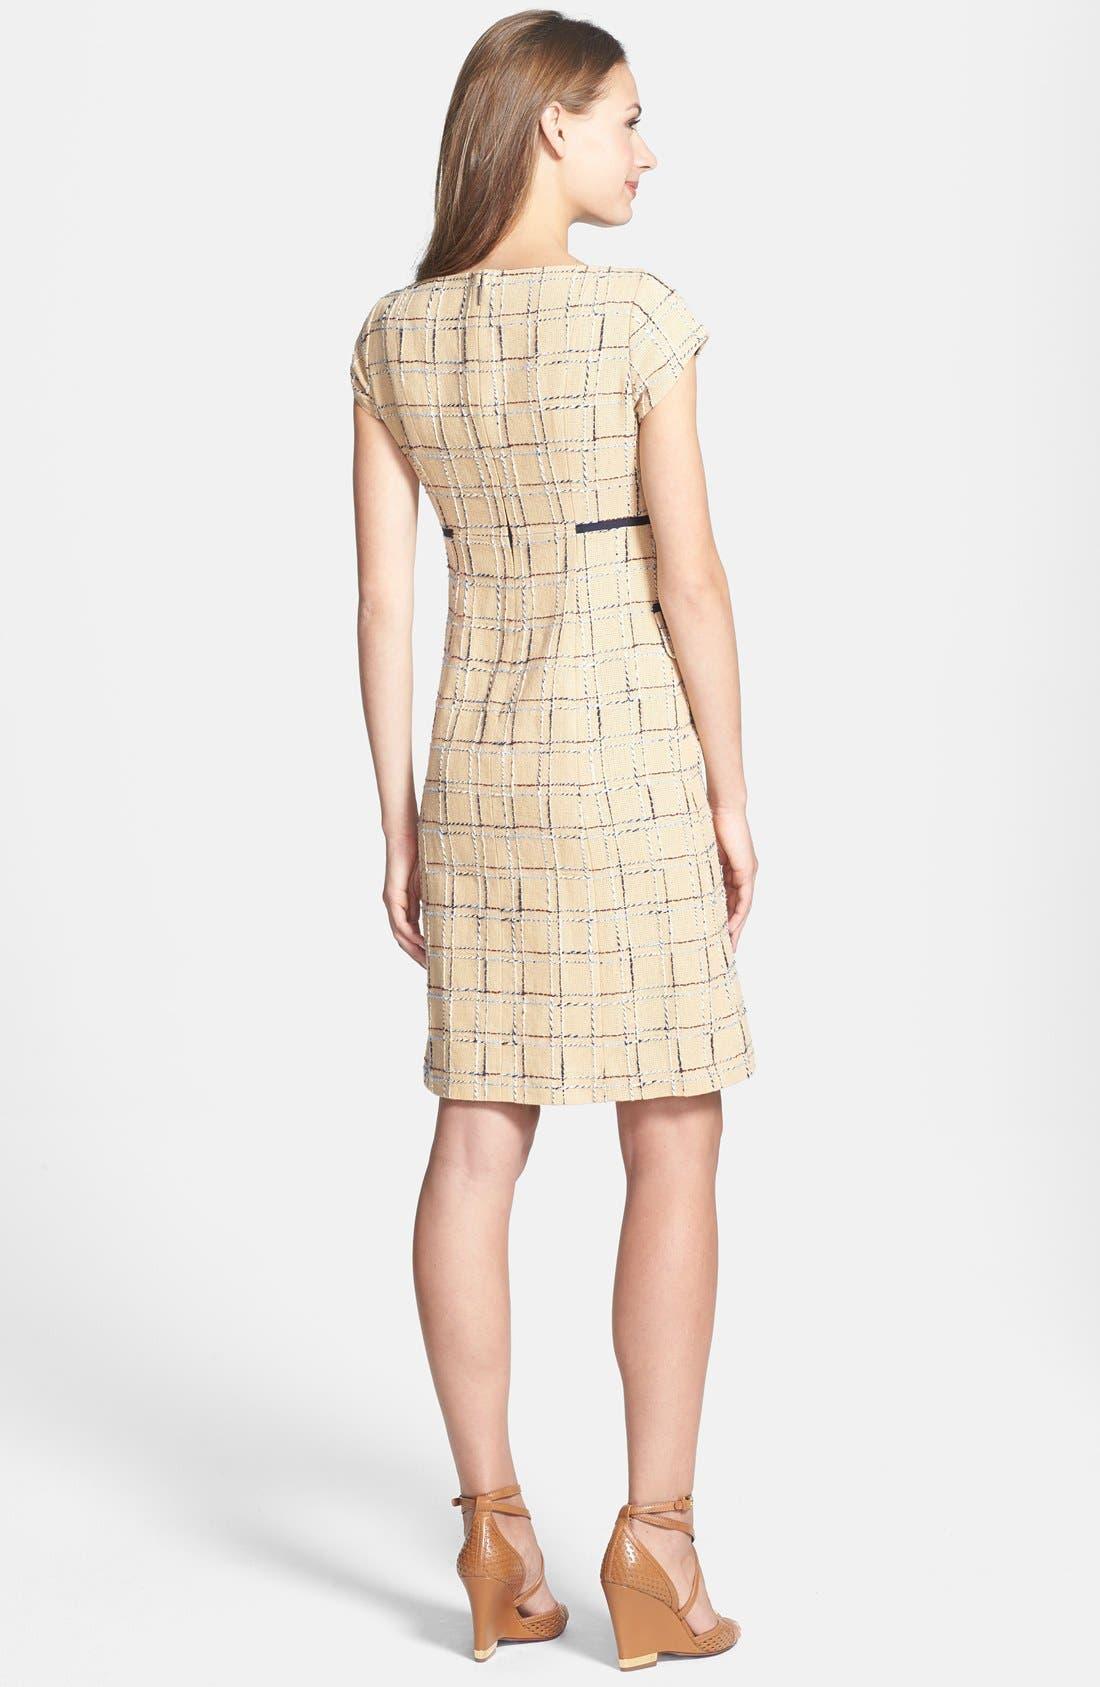 Alternate Image 2  - Tory Burch 'Evie' Woven Cotton & Linen Sheath Dress